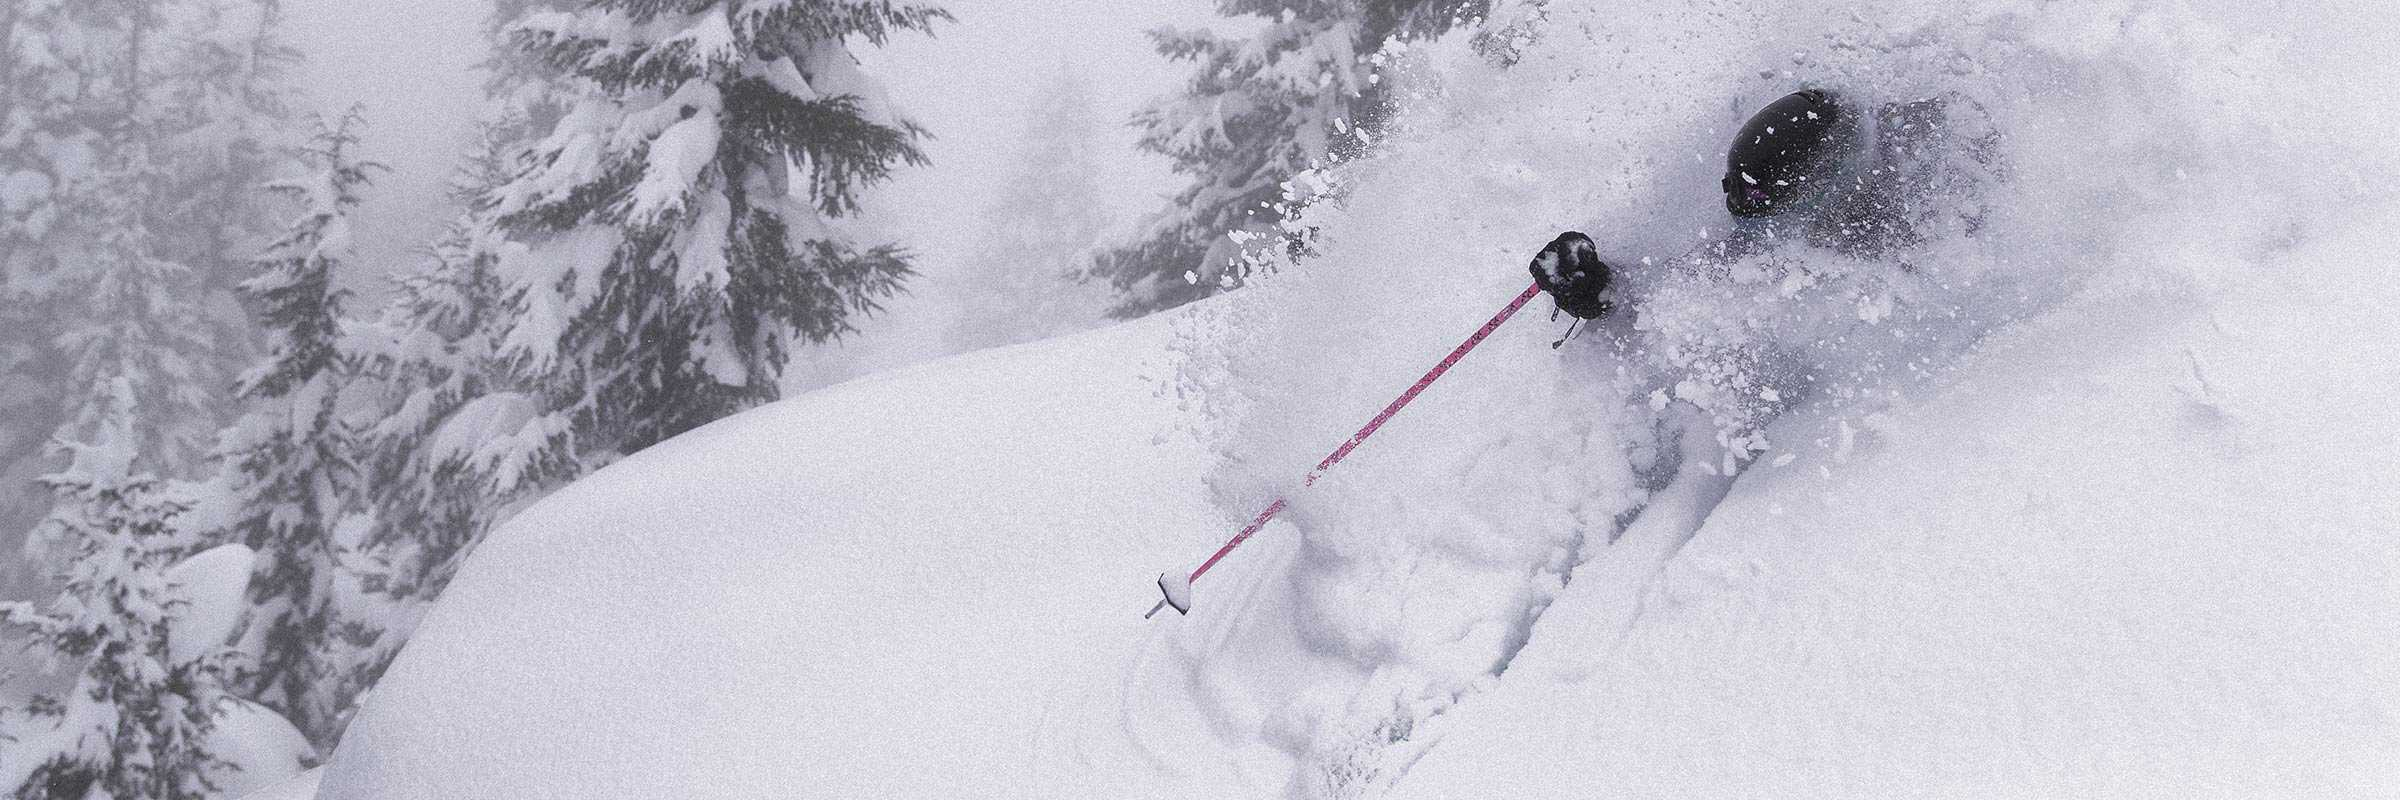 Arc'teryx Women's Ski & Snowboard Jackets for Winter 2018